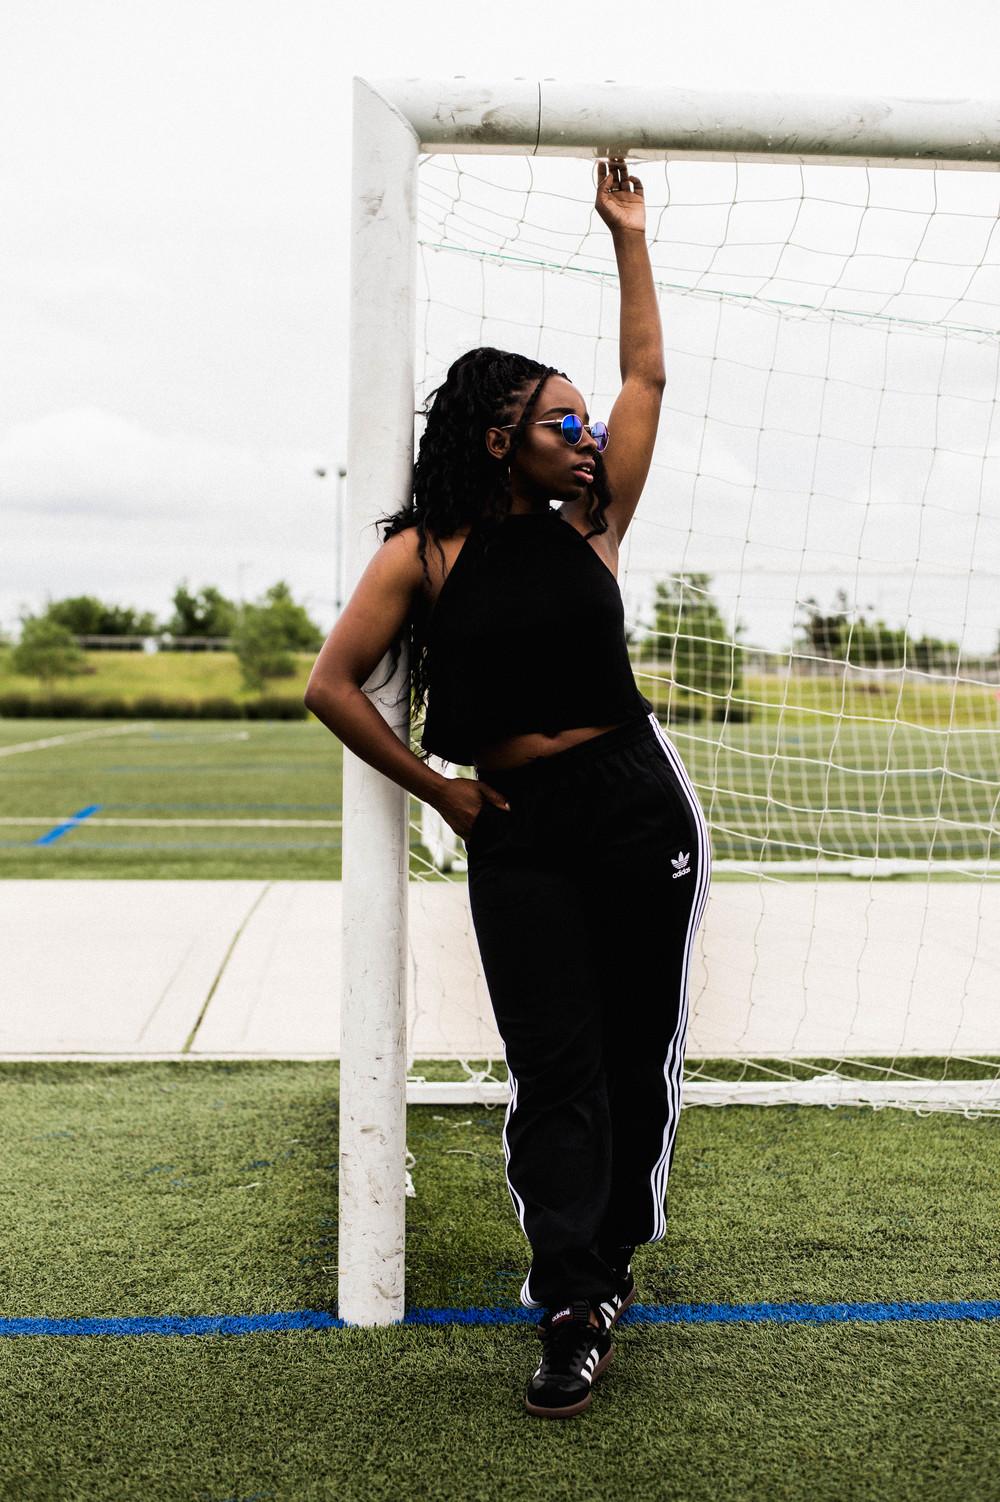 The_Glossier_Tasha_James_Blogger_style_fashion_Adidas_Soccer_futbol_Samba_Editorial_Summer_2016-32.jpg